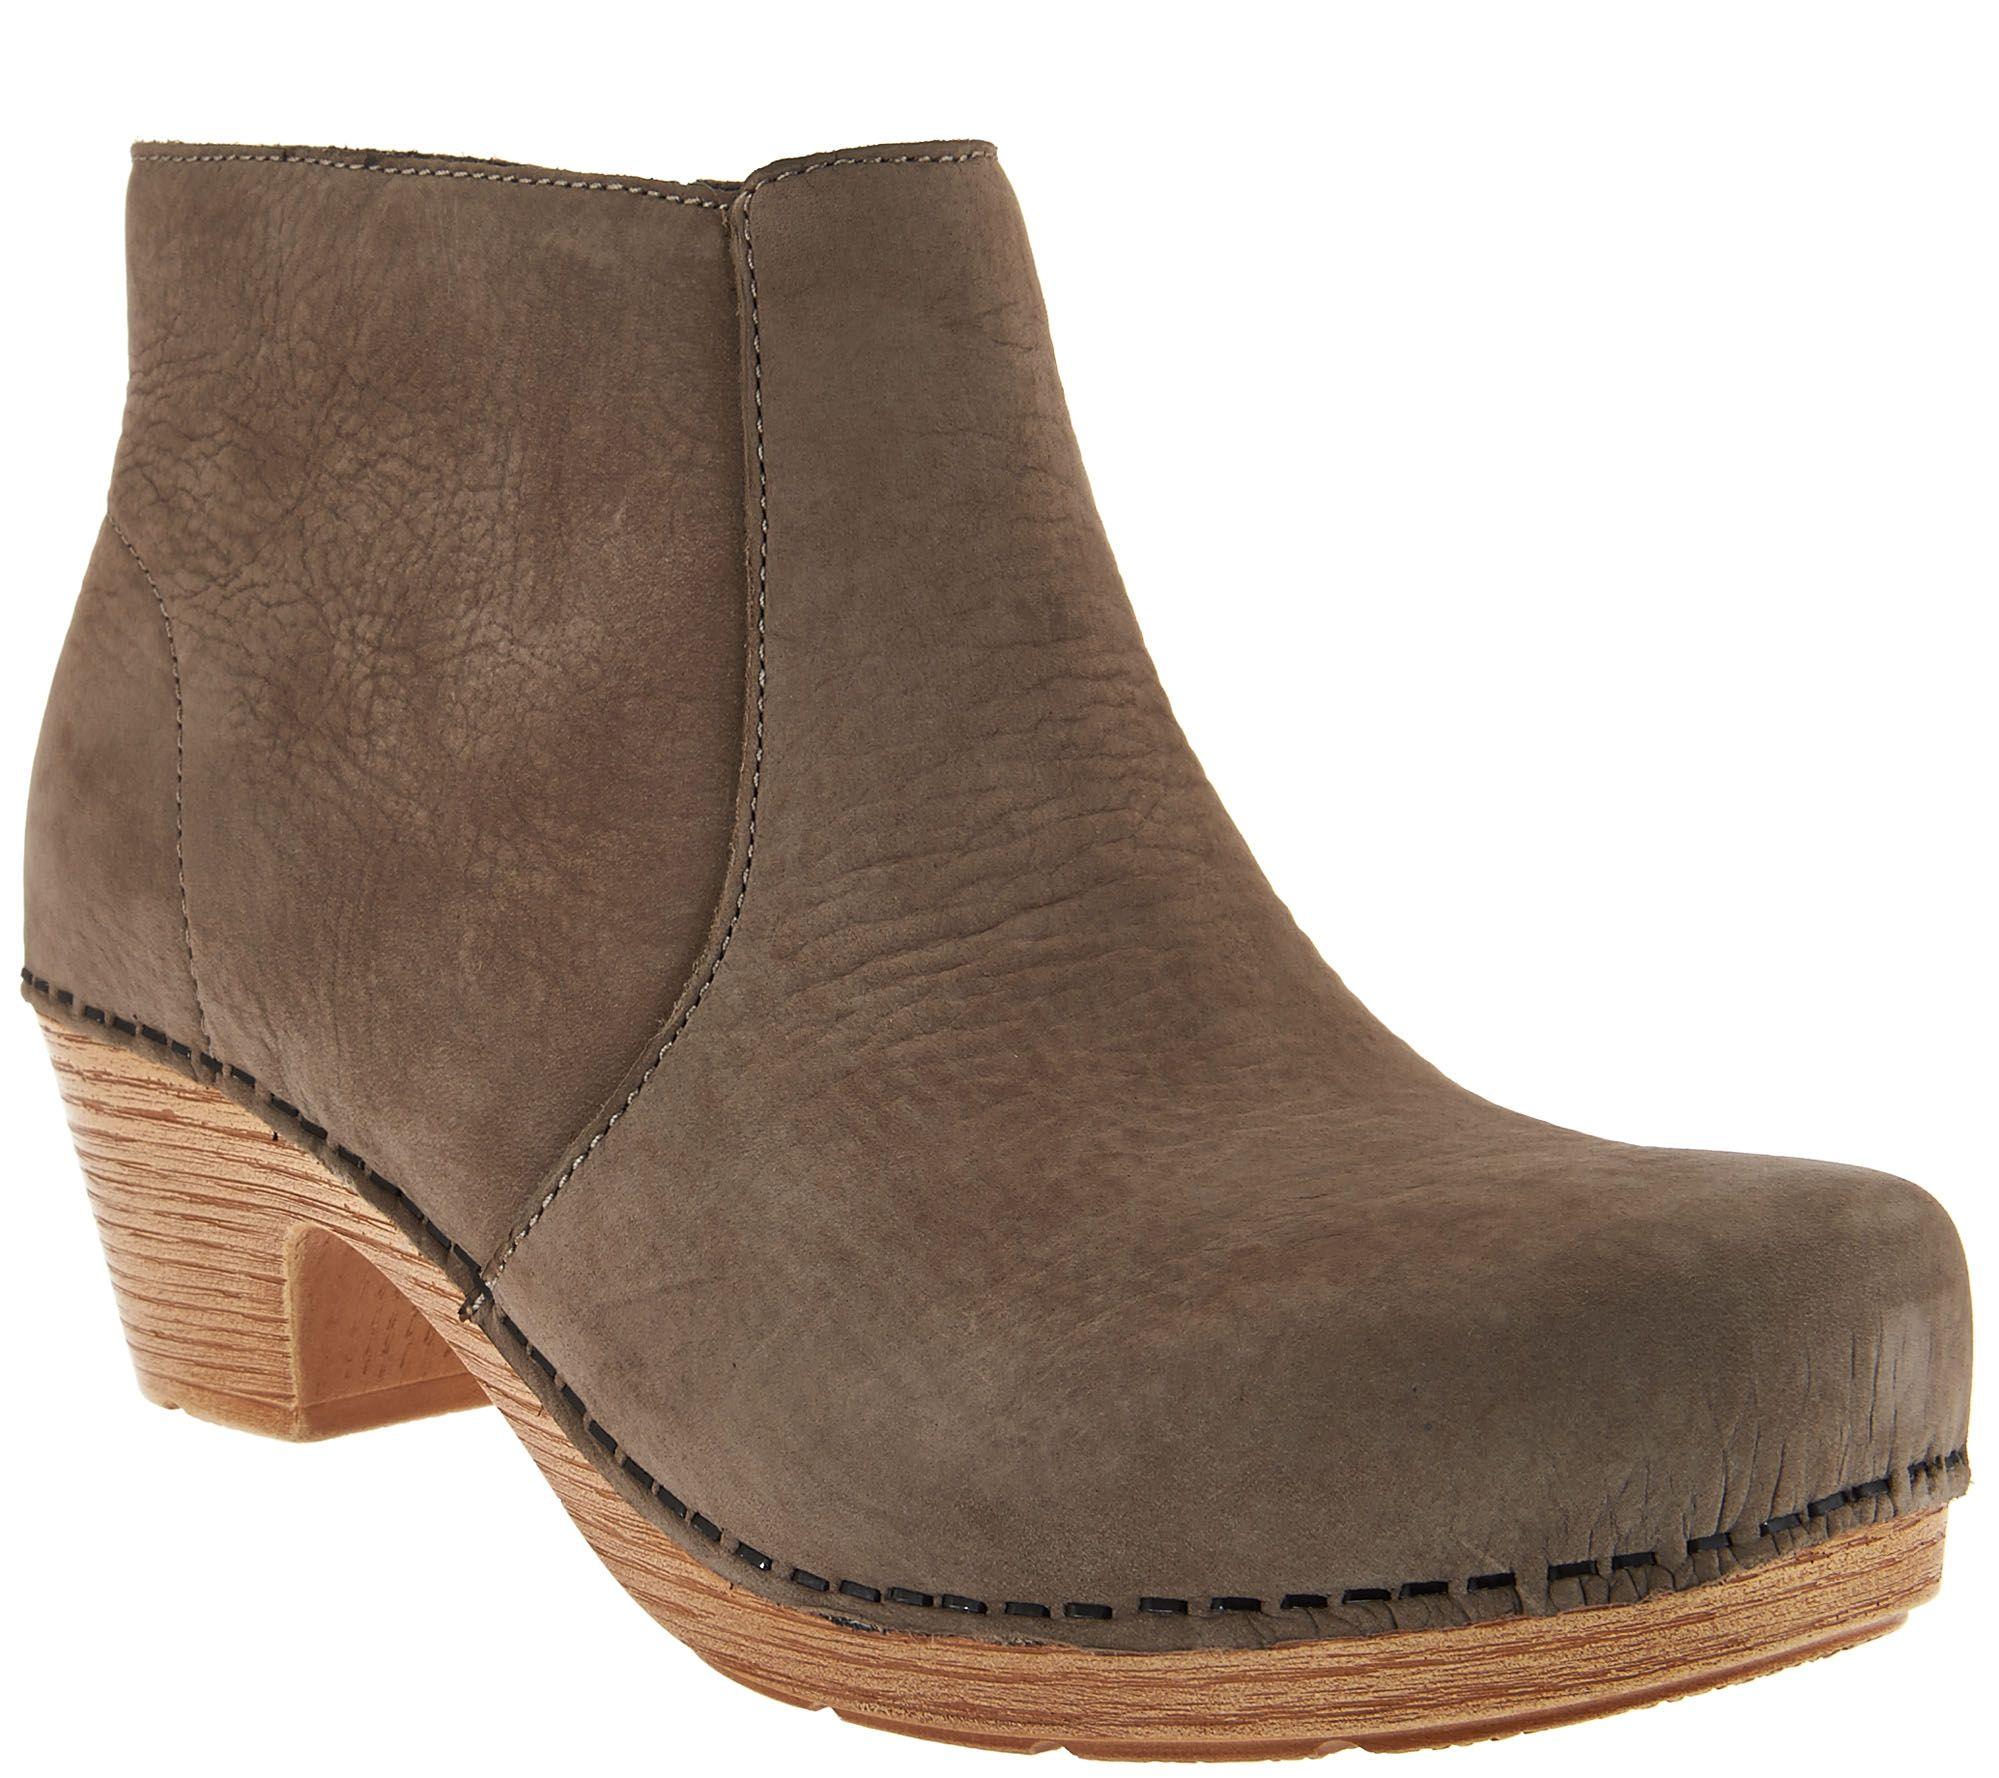 Dansko Nubuck Clog Boots Maria Page 1